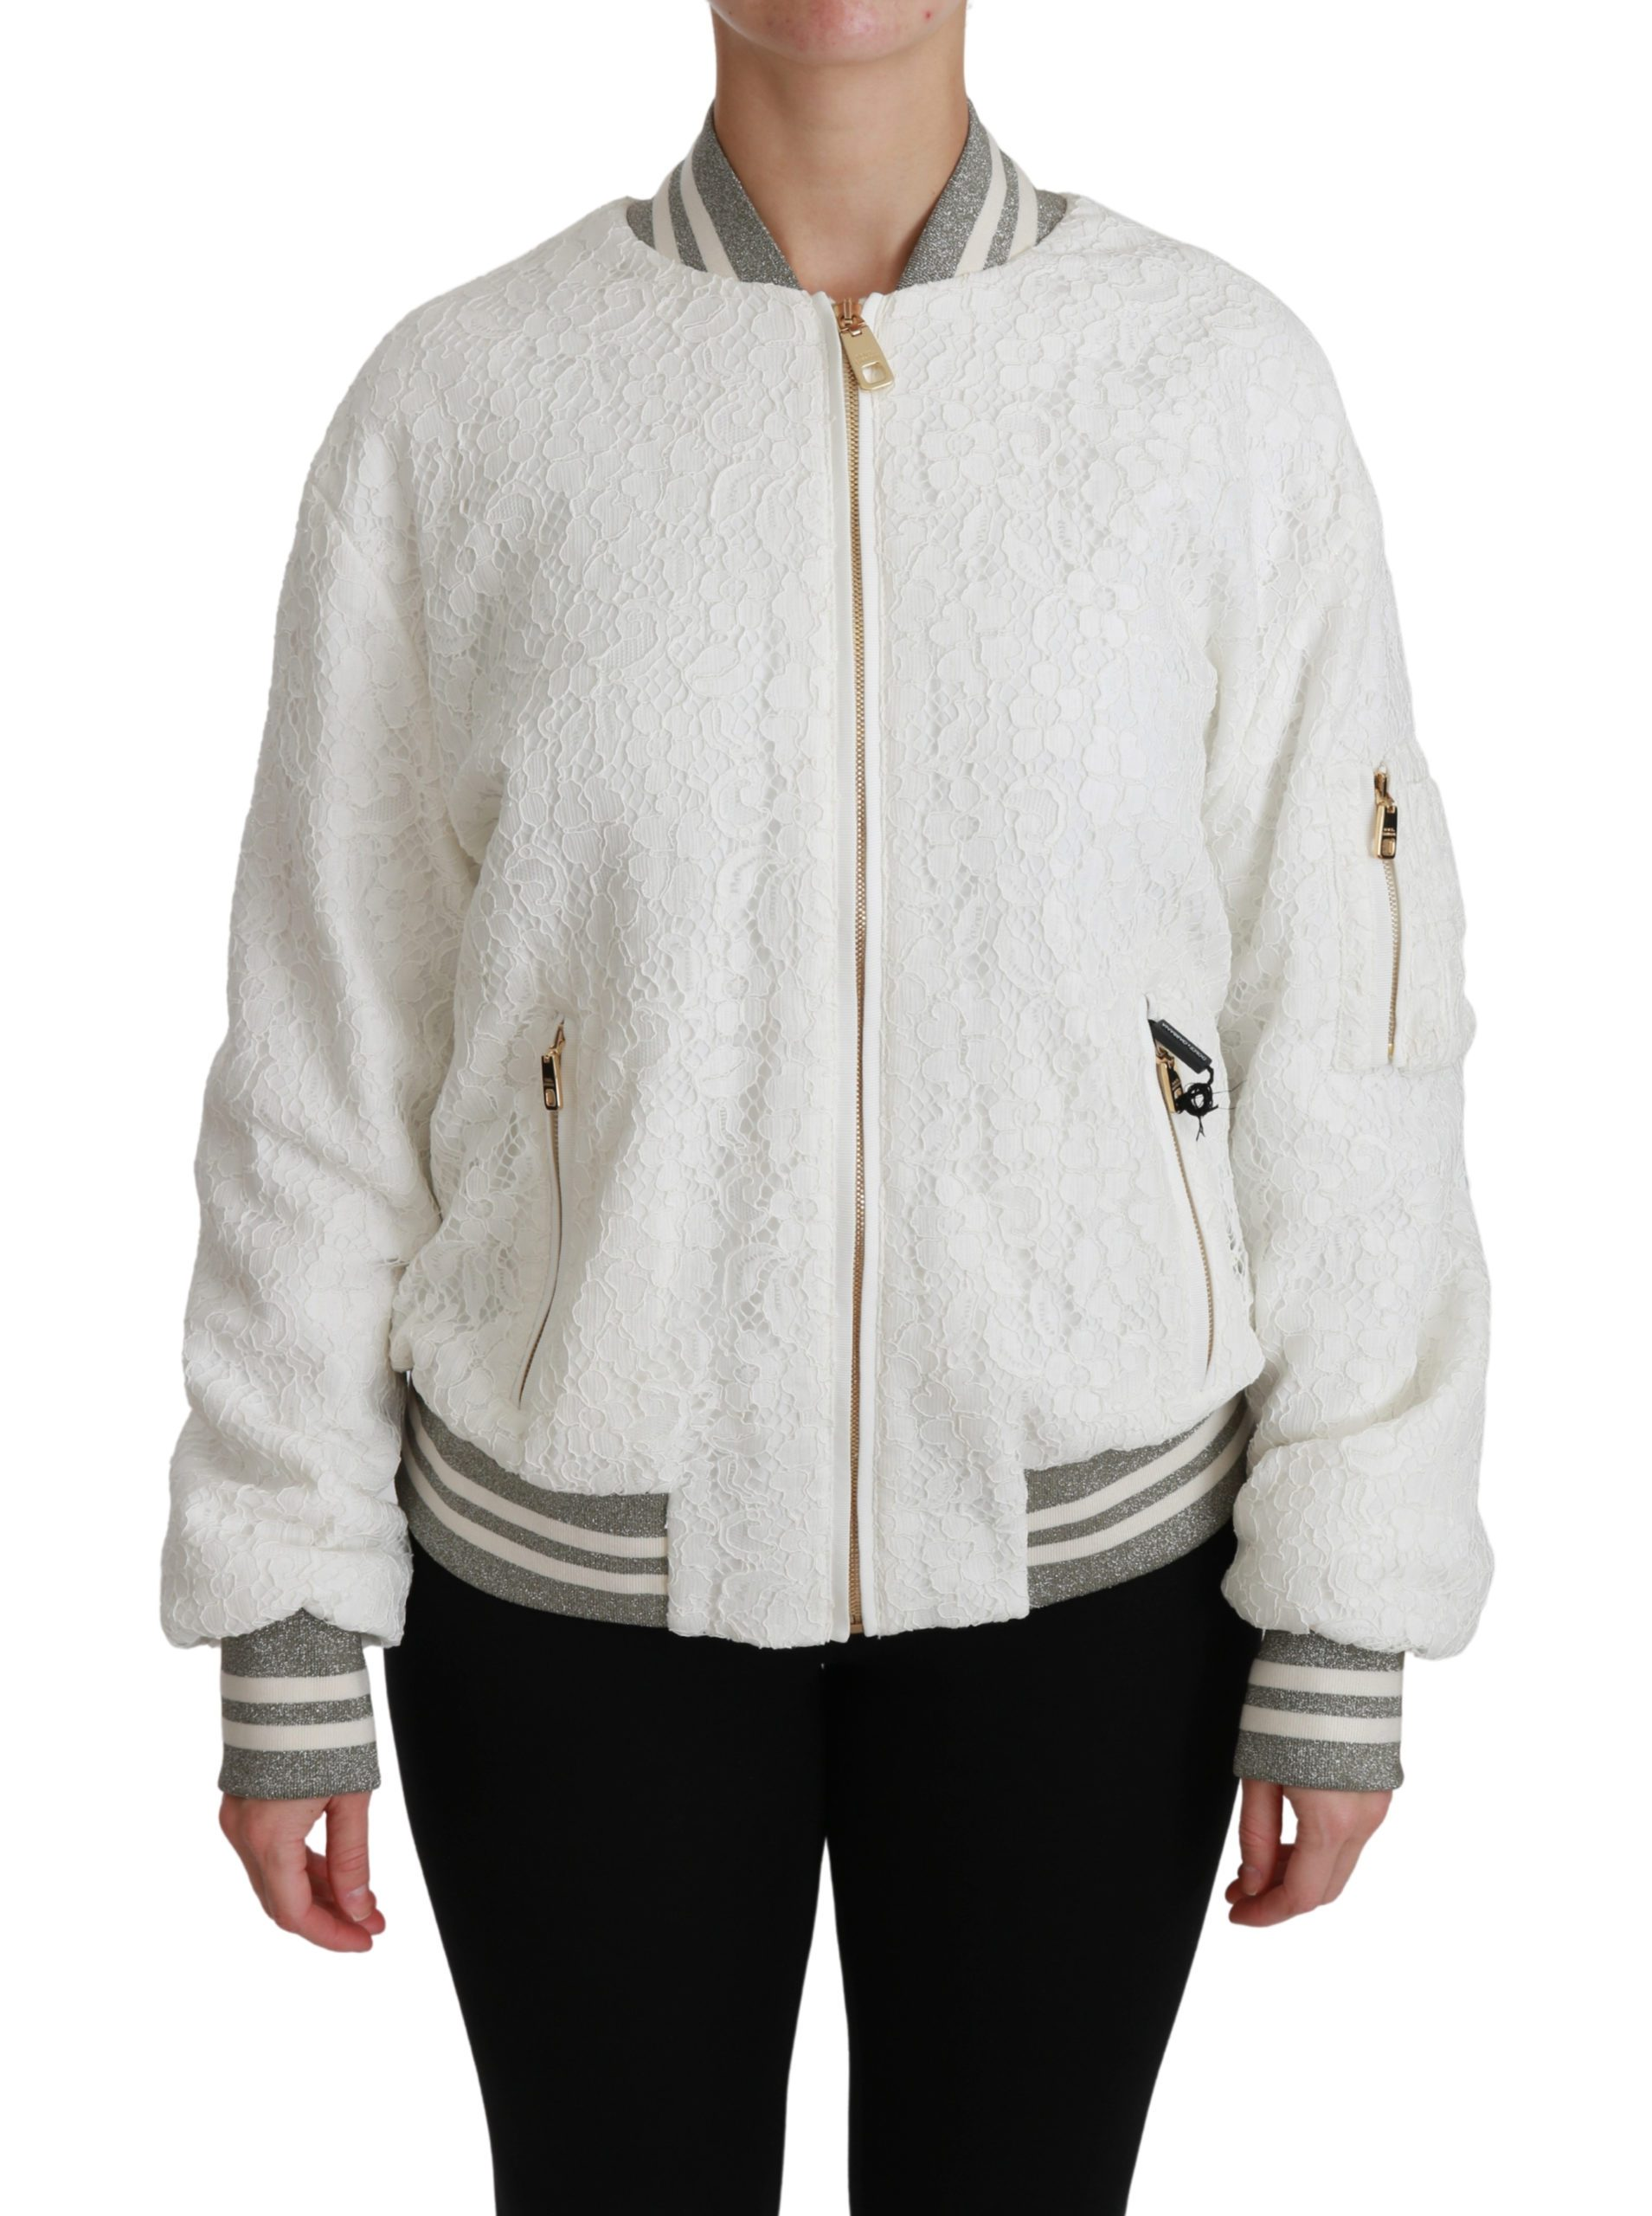 Dolce & Gabbana Women's Lace Full Zip Bomber Cotton Jacket White JKT2557 - IT40 S